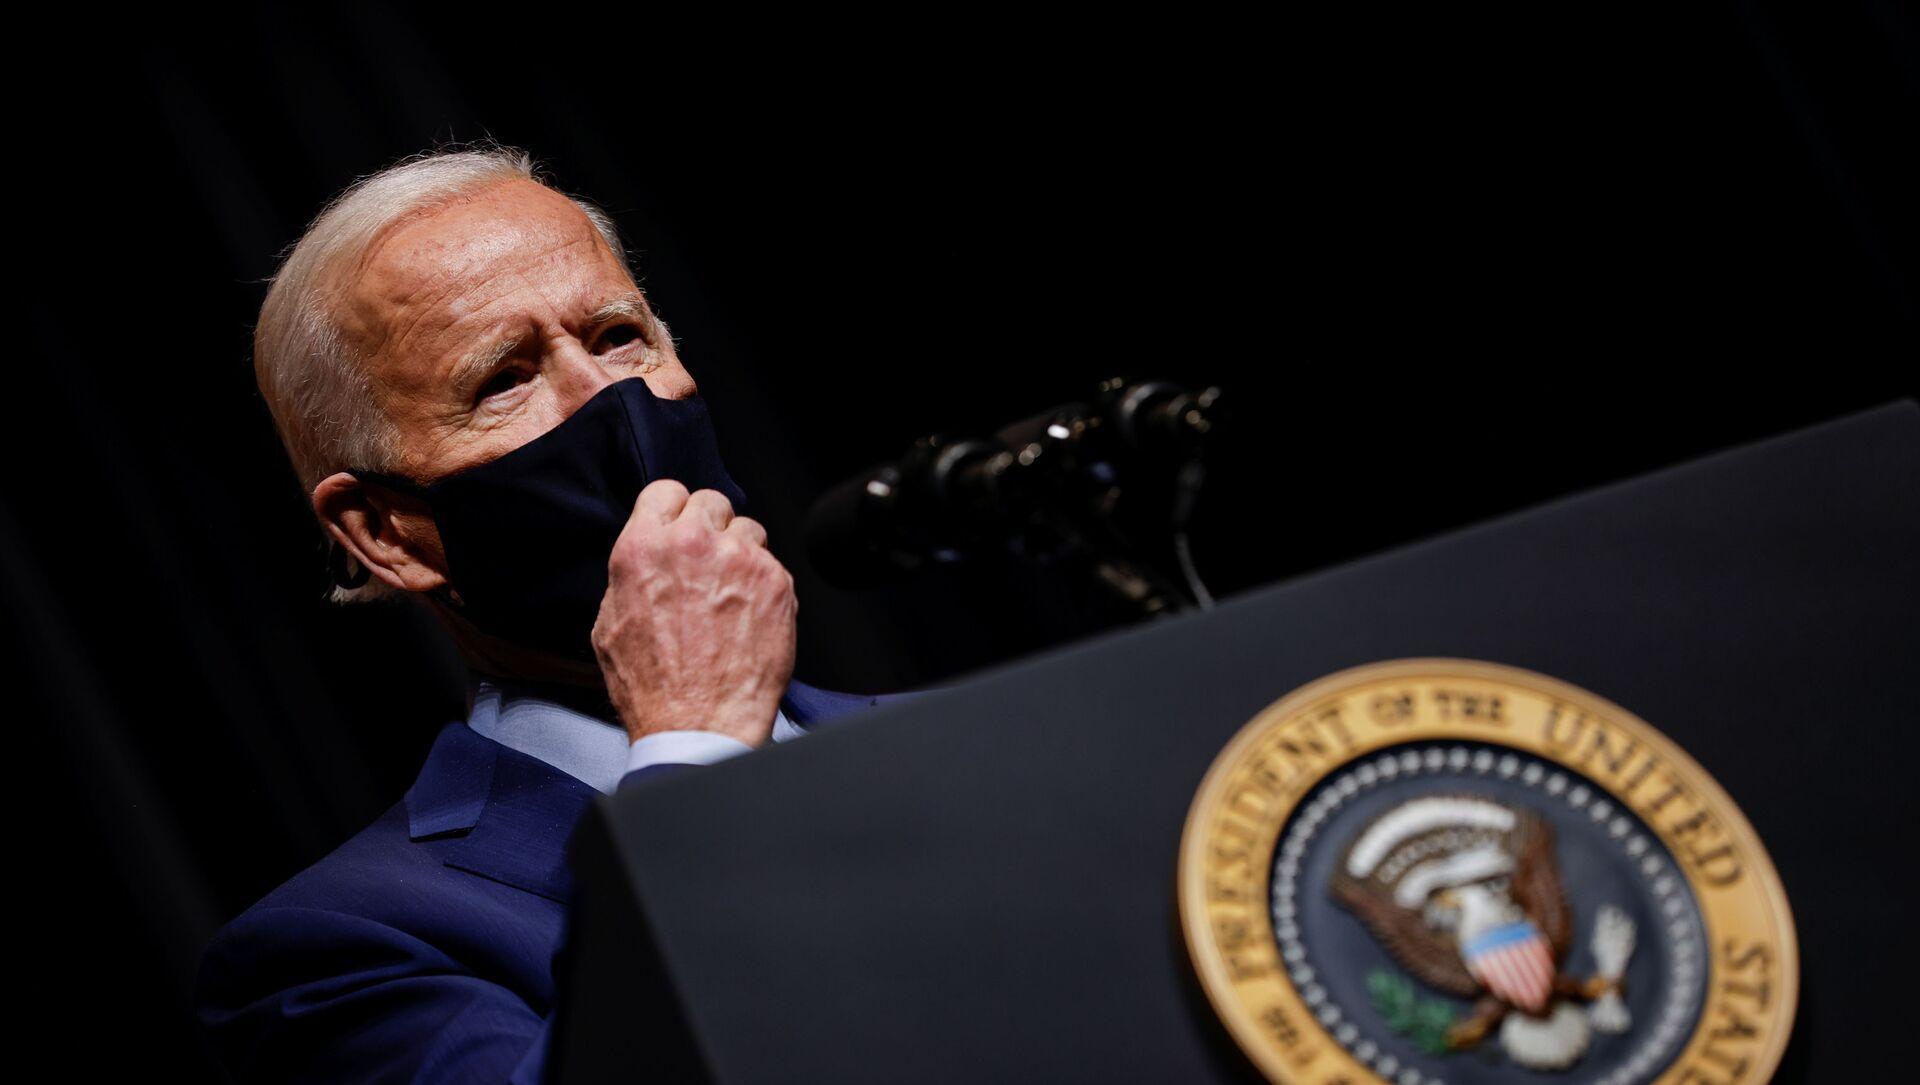 U.S. President Joe Biden removes his mask to address NIH staff during a visit to NIH in Bethesda, Maryland, U.S., February 11, 2021.  - Sputnik Italia, 1920, 19.02.2021